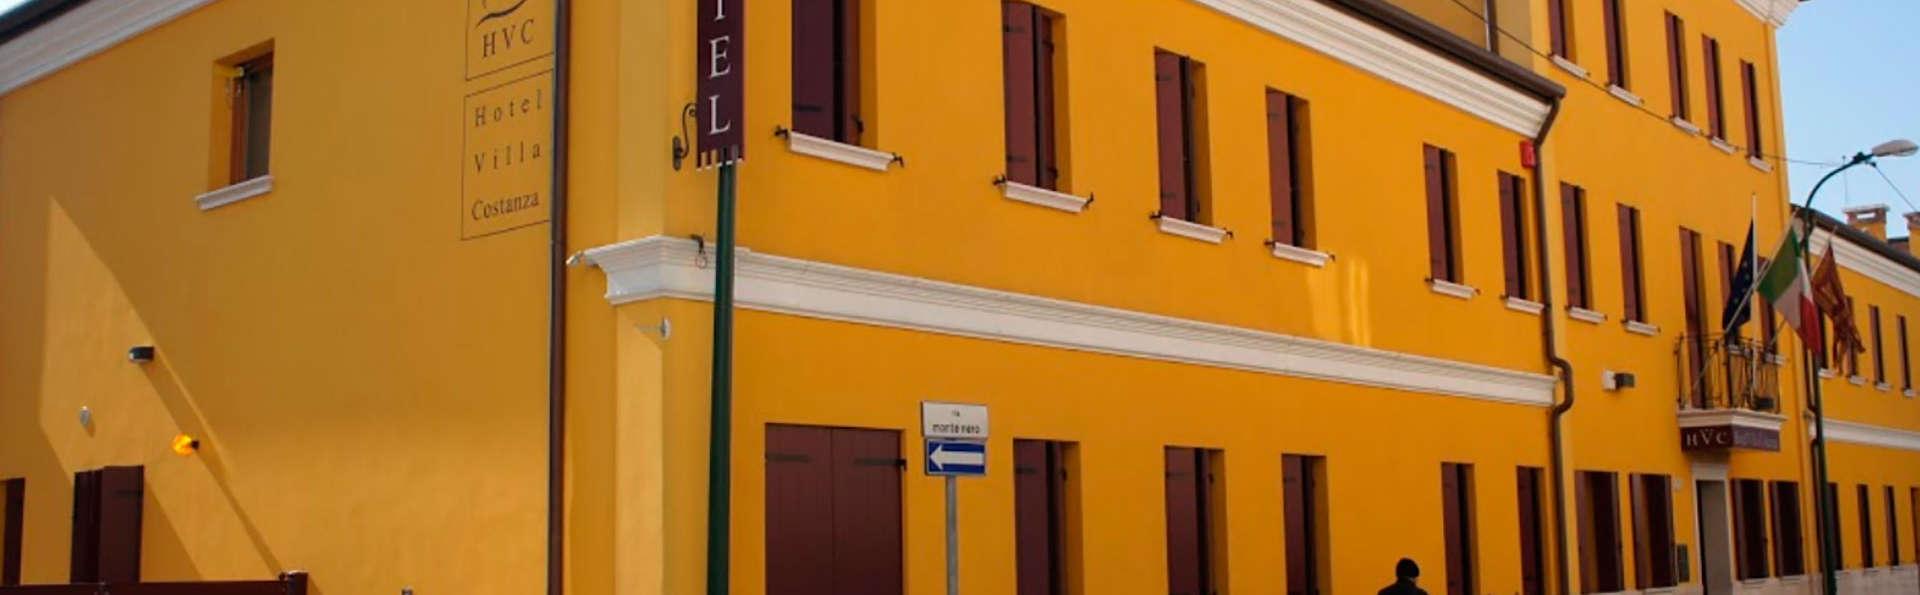 Hotel Villa Costanza - EDIT_front2.jpg